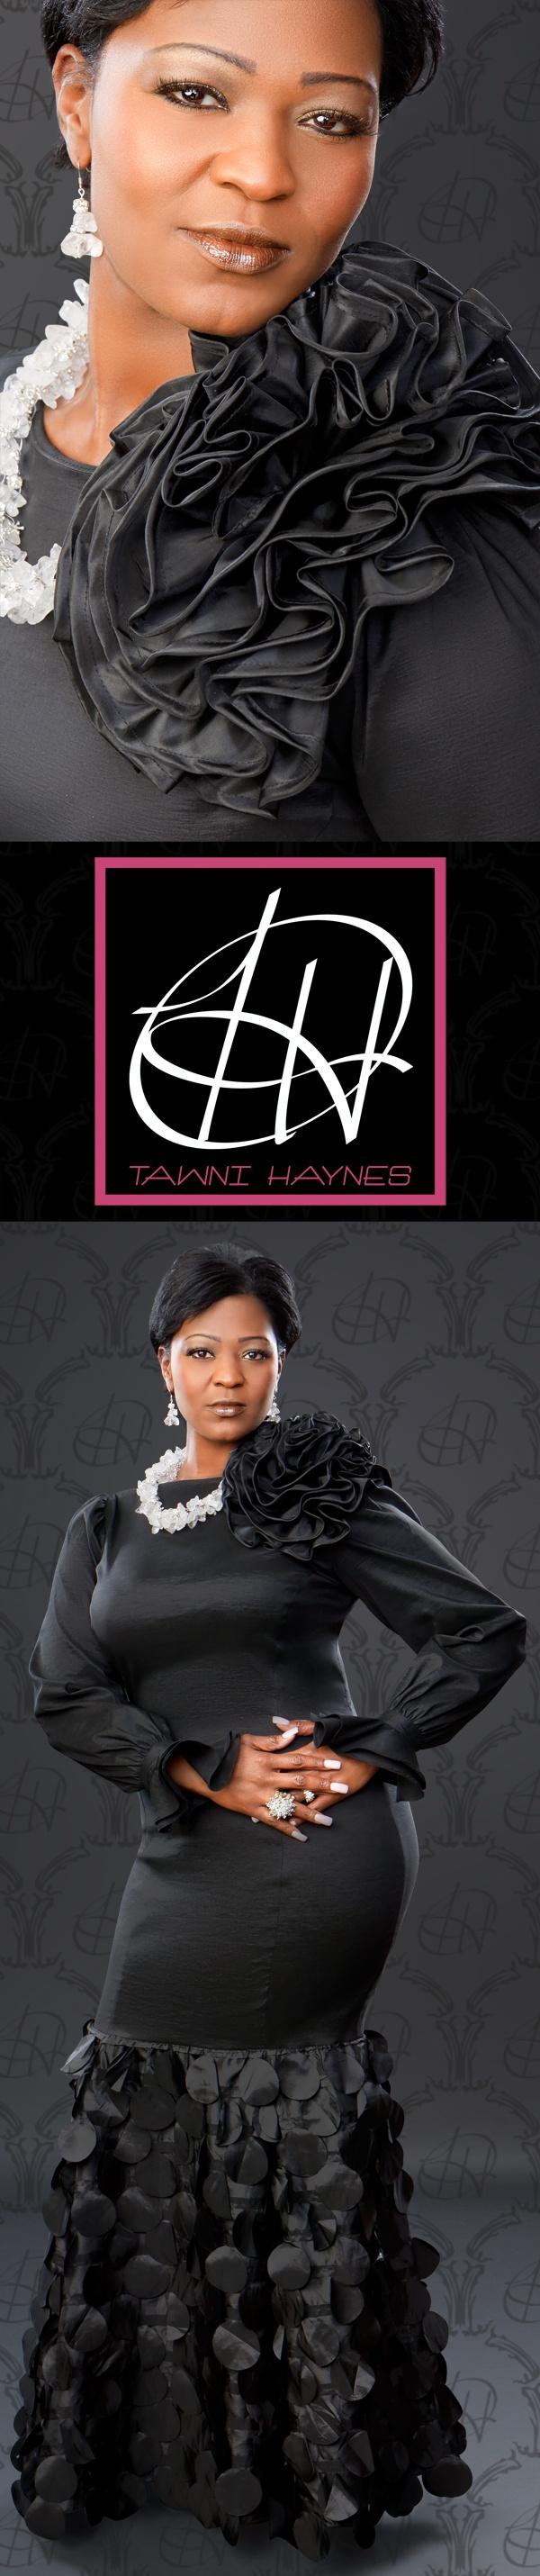 Tawni Haynes Custom Made Black Gown w/ Flower & Petal details.